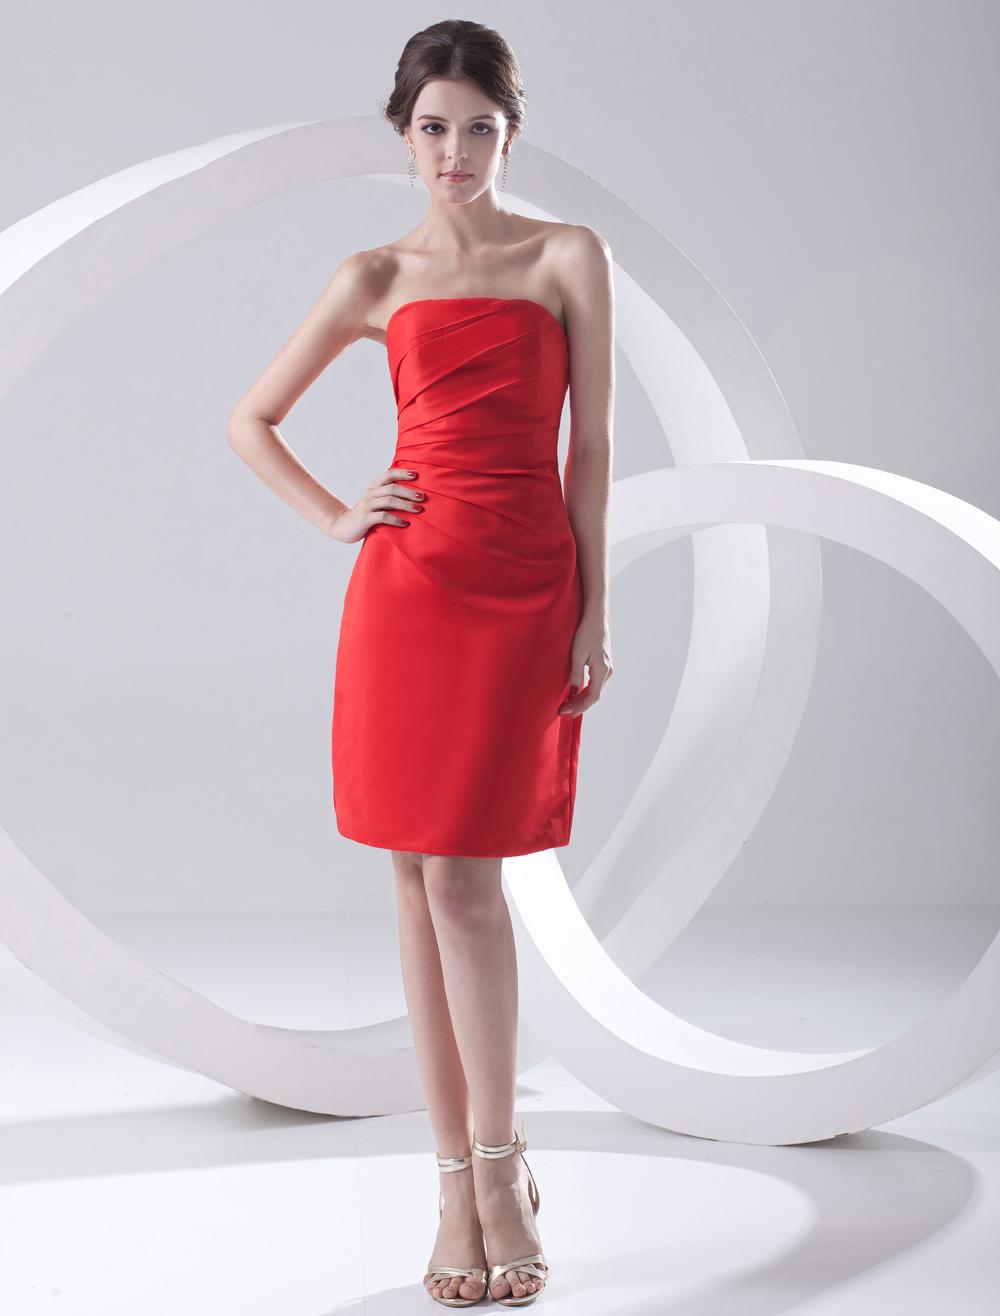 Sheath Red Satin Strapless Knee-Length Women's Cocktail Dress (Wedding Cheap Party Dress) photo